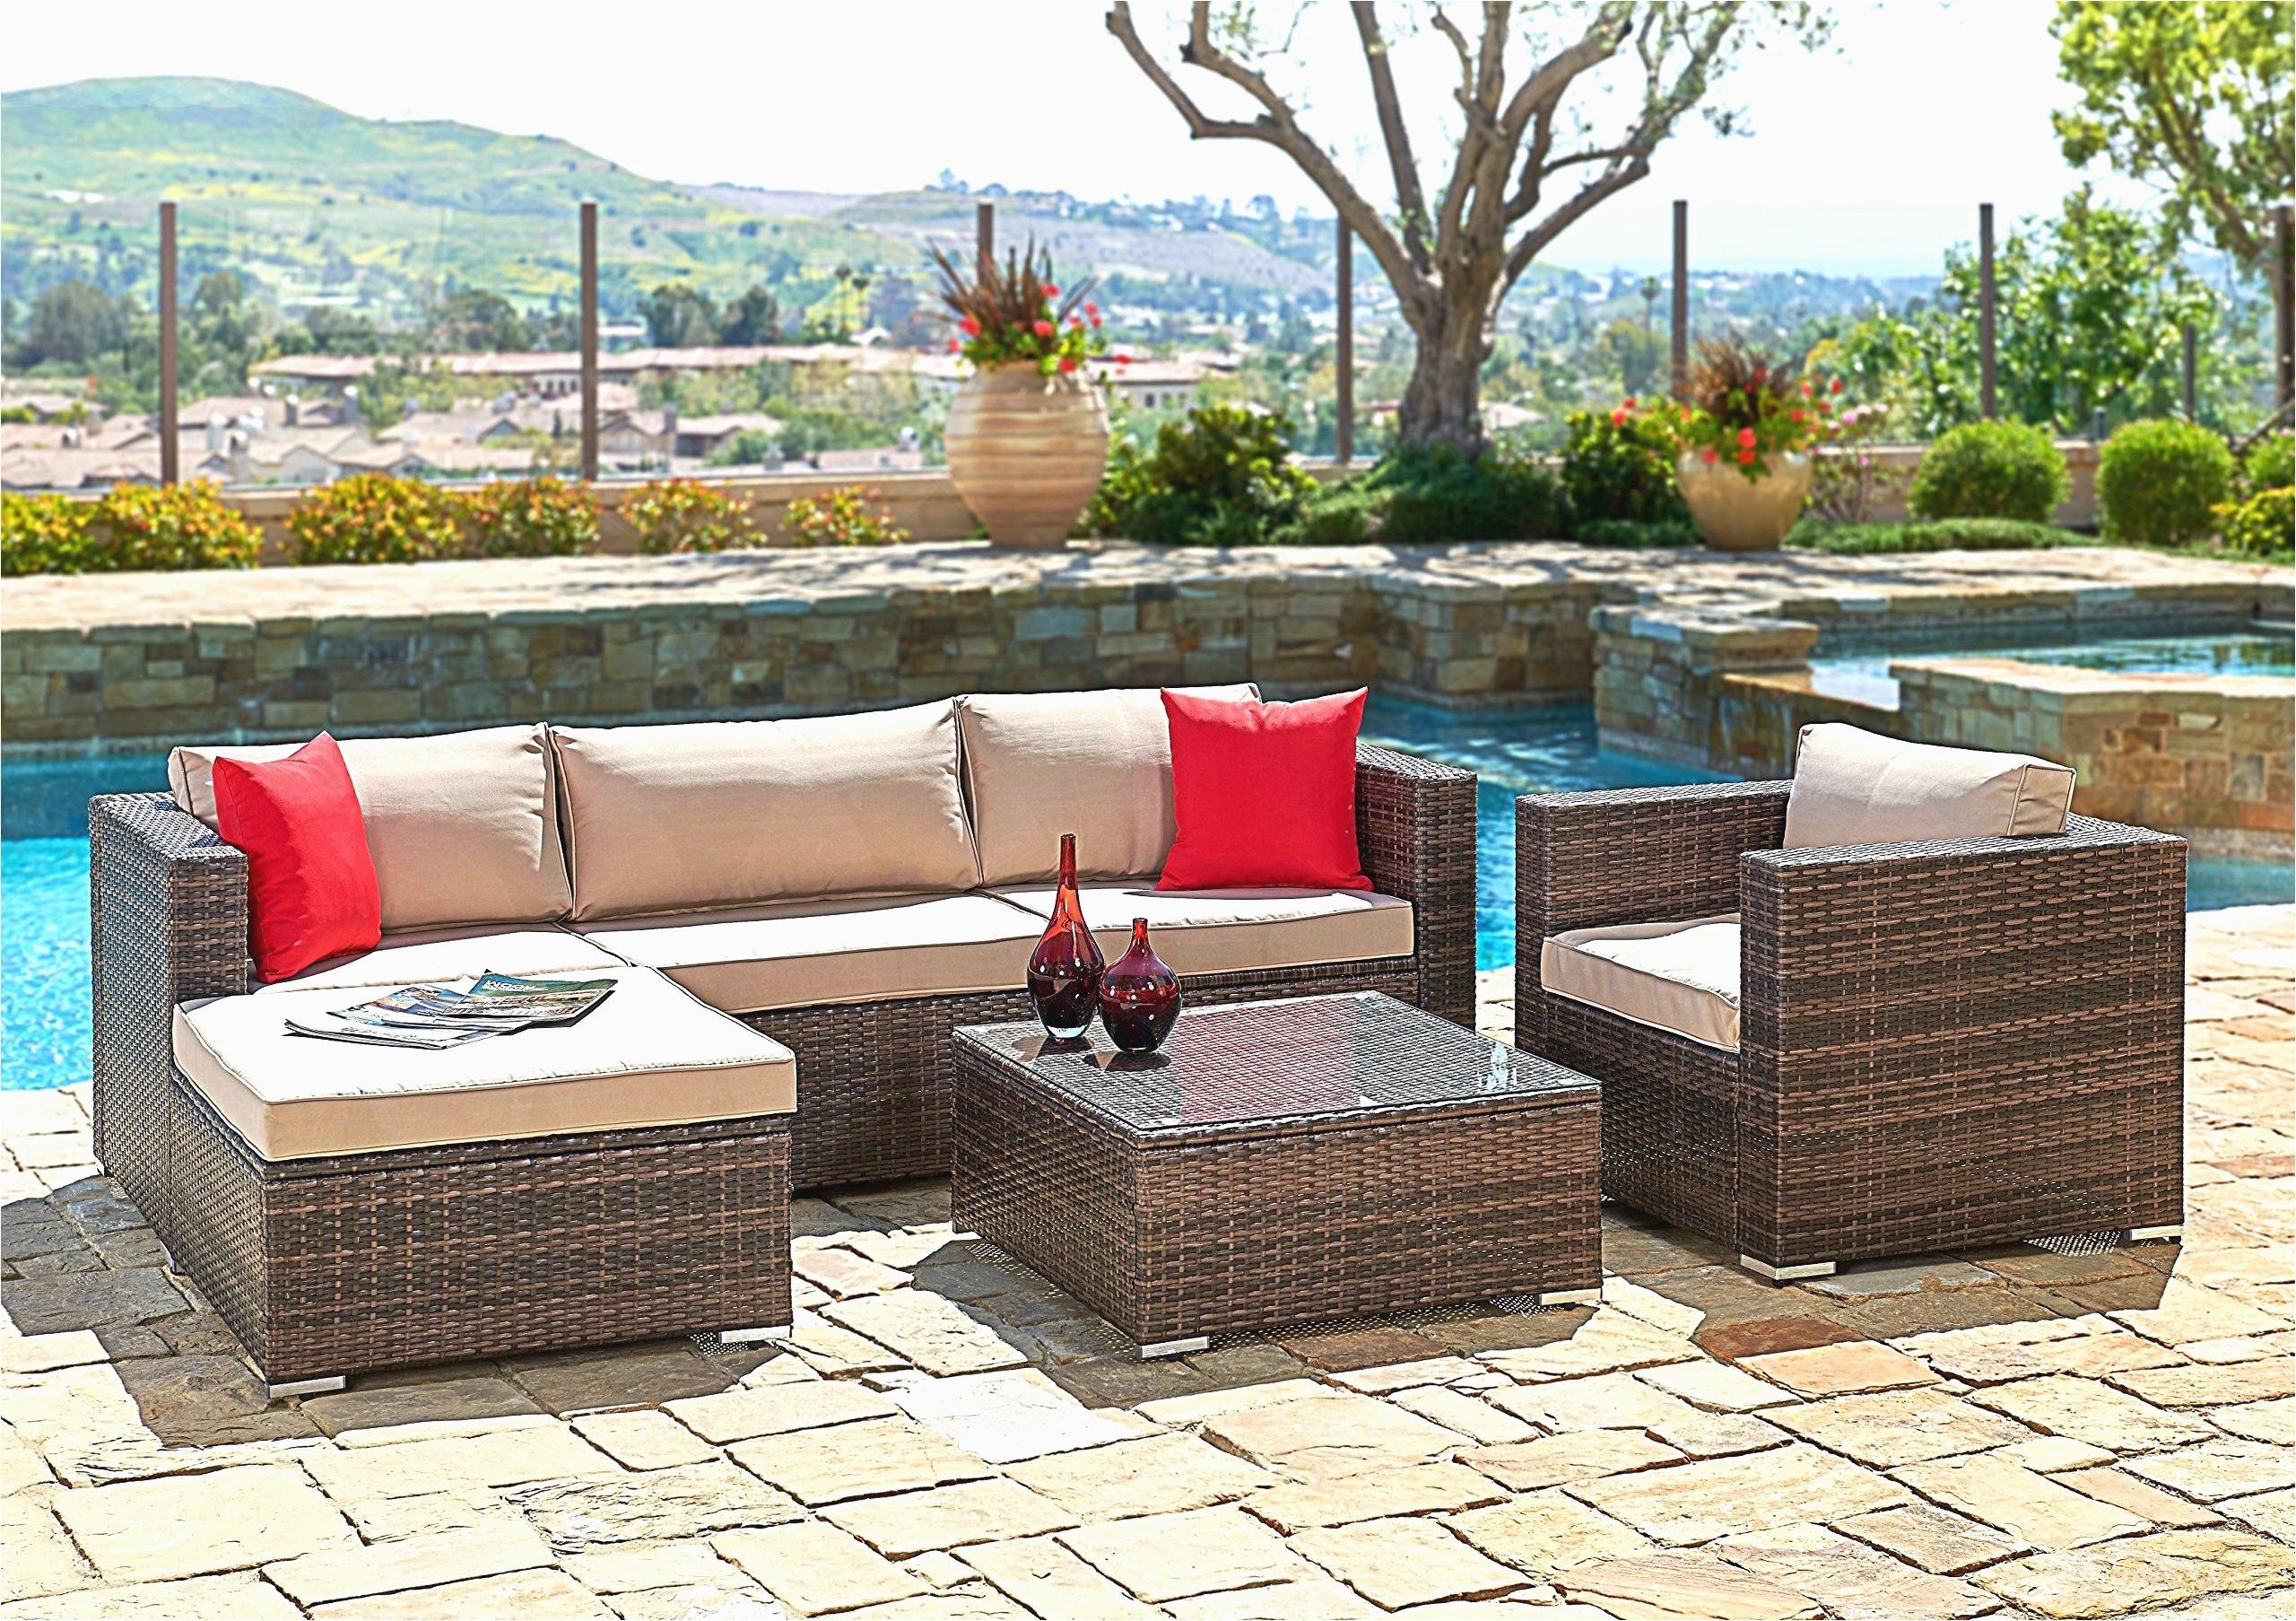 World source Patio Furniture 23 Popular World source Patio Furniture Pics Home Furniture Ideas